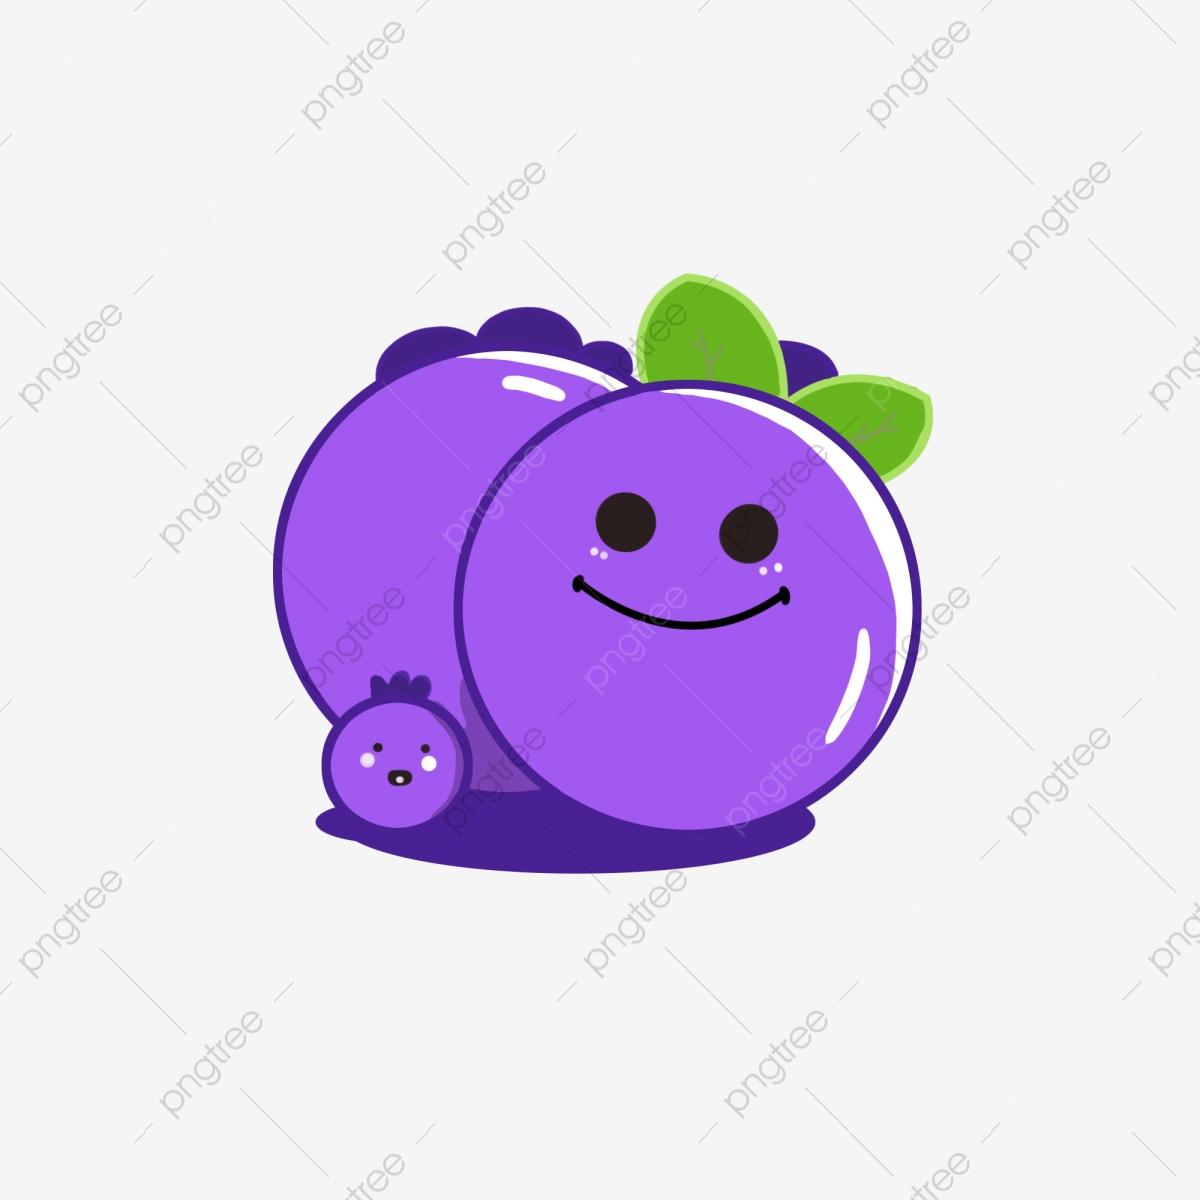 Warm happy cartoon mood. Blueberry clipart color